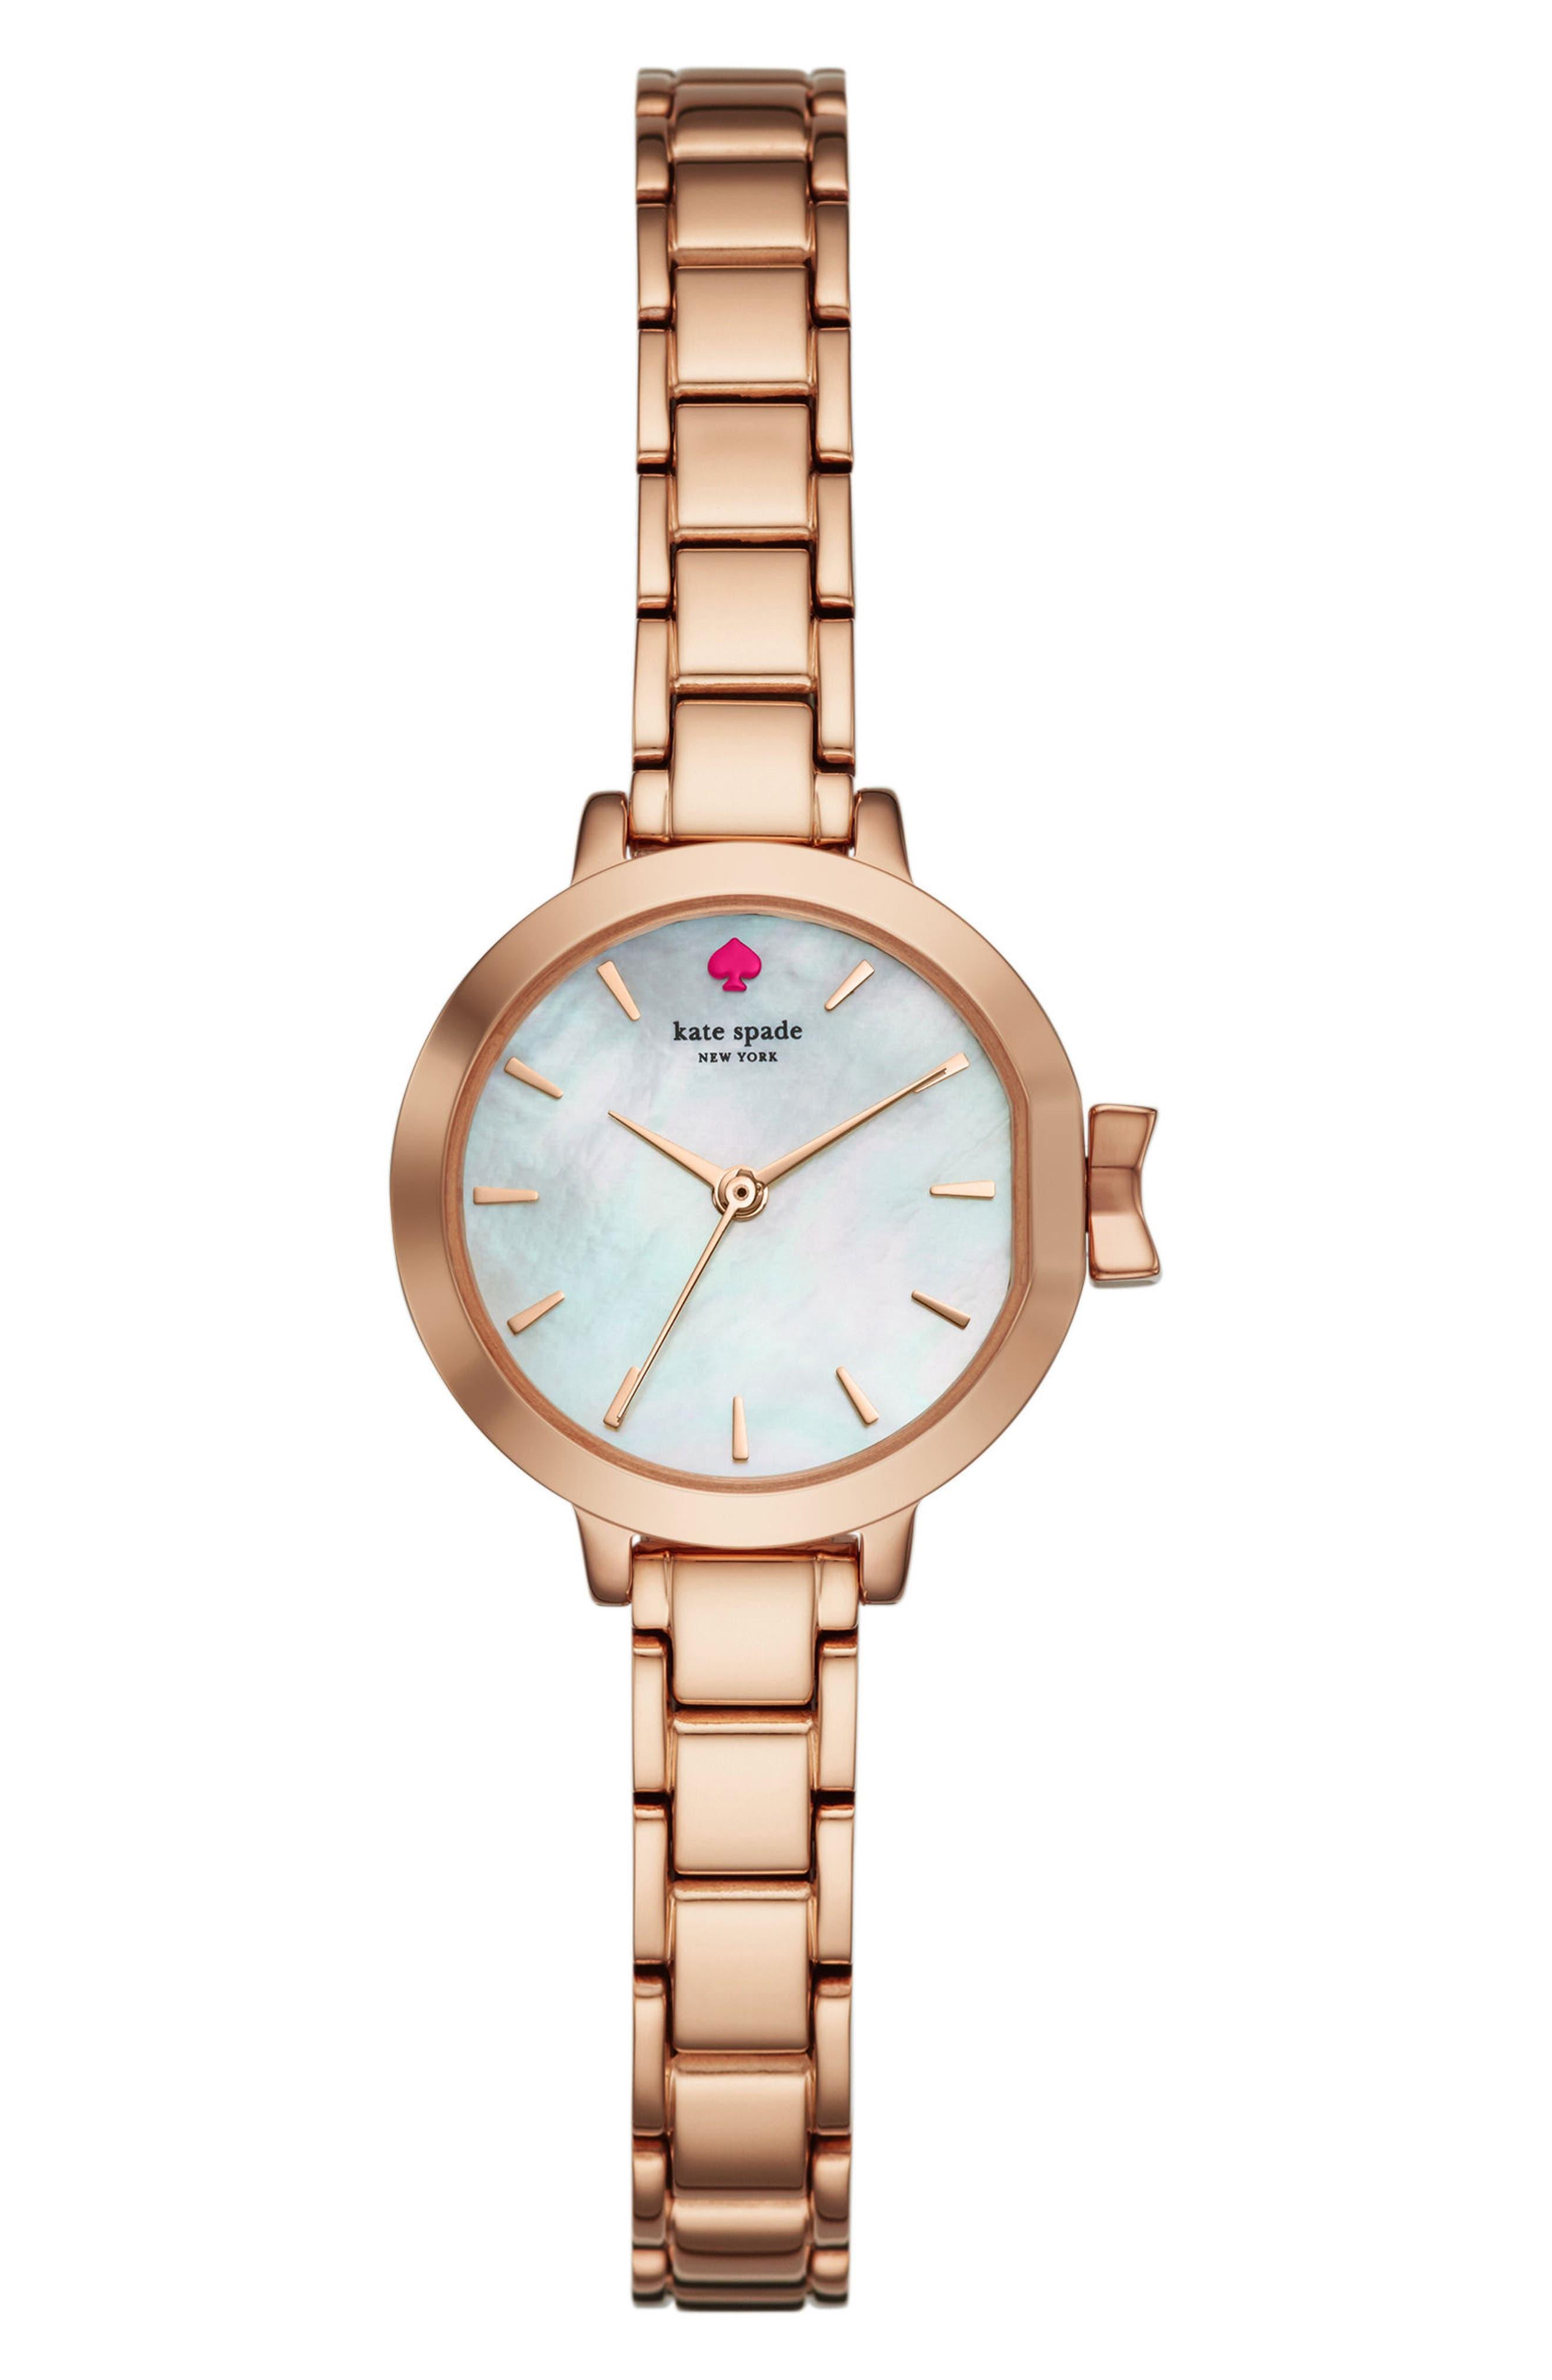 Main Image - kate spade new york park row bracelet watch, 24mm